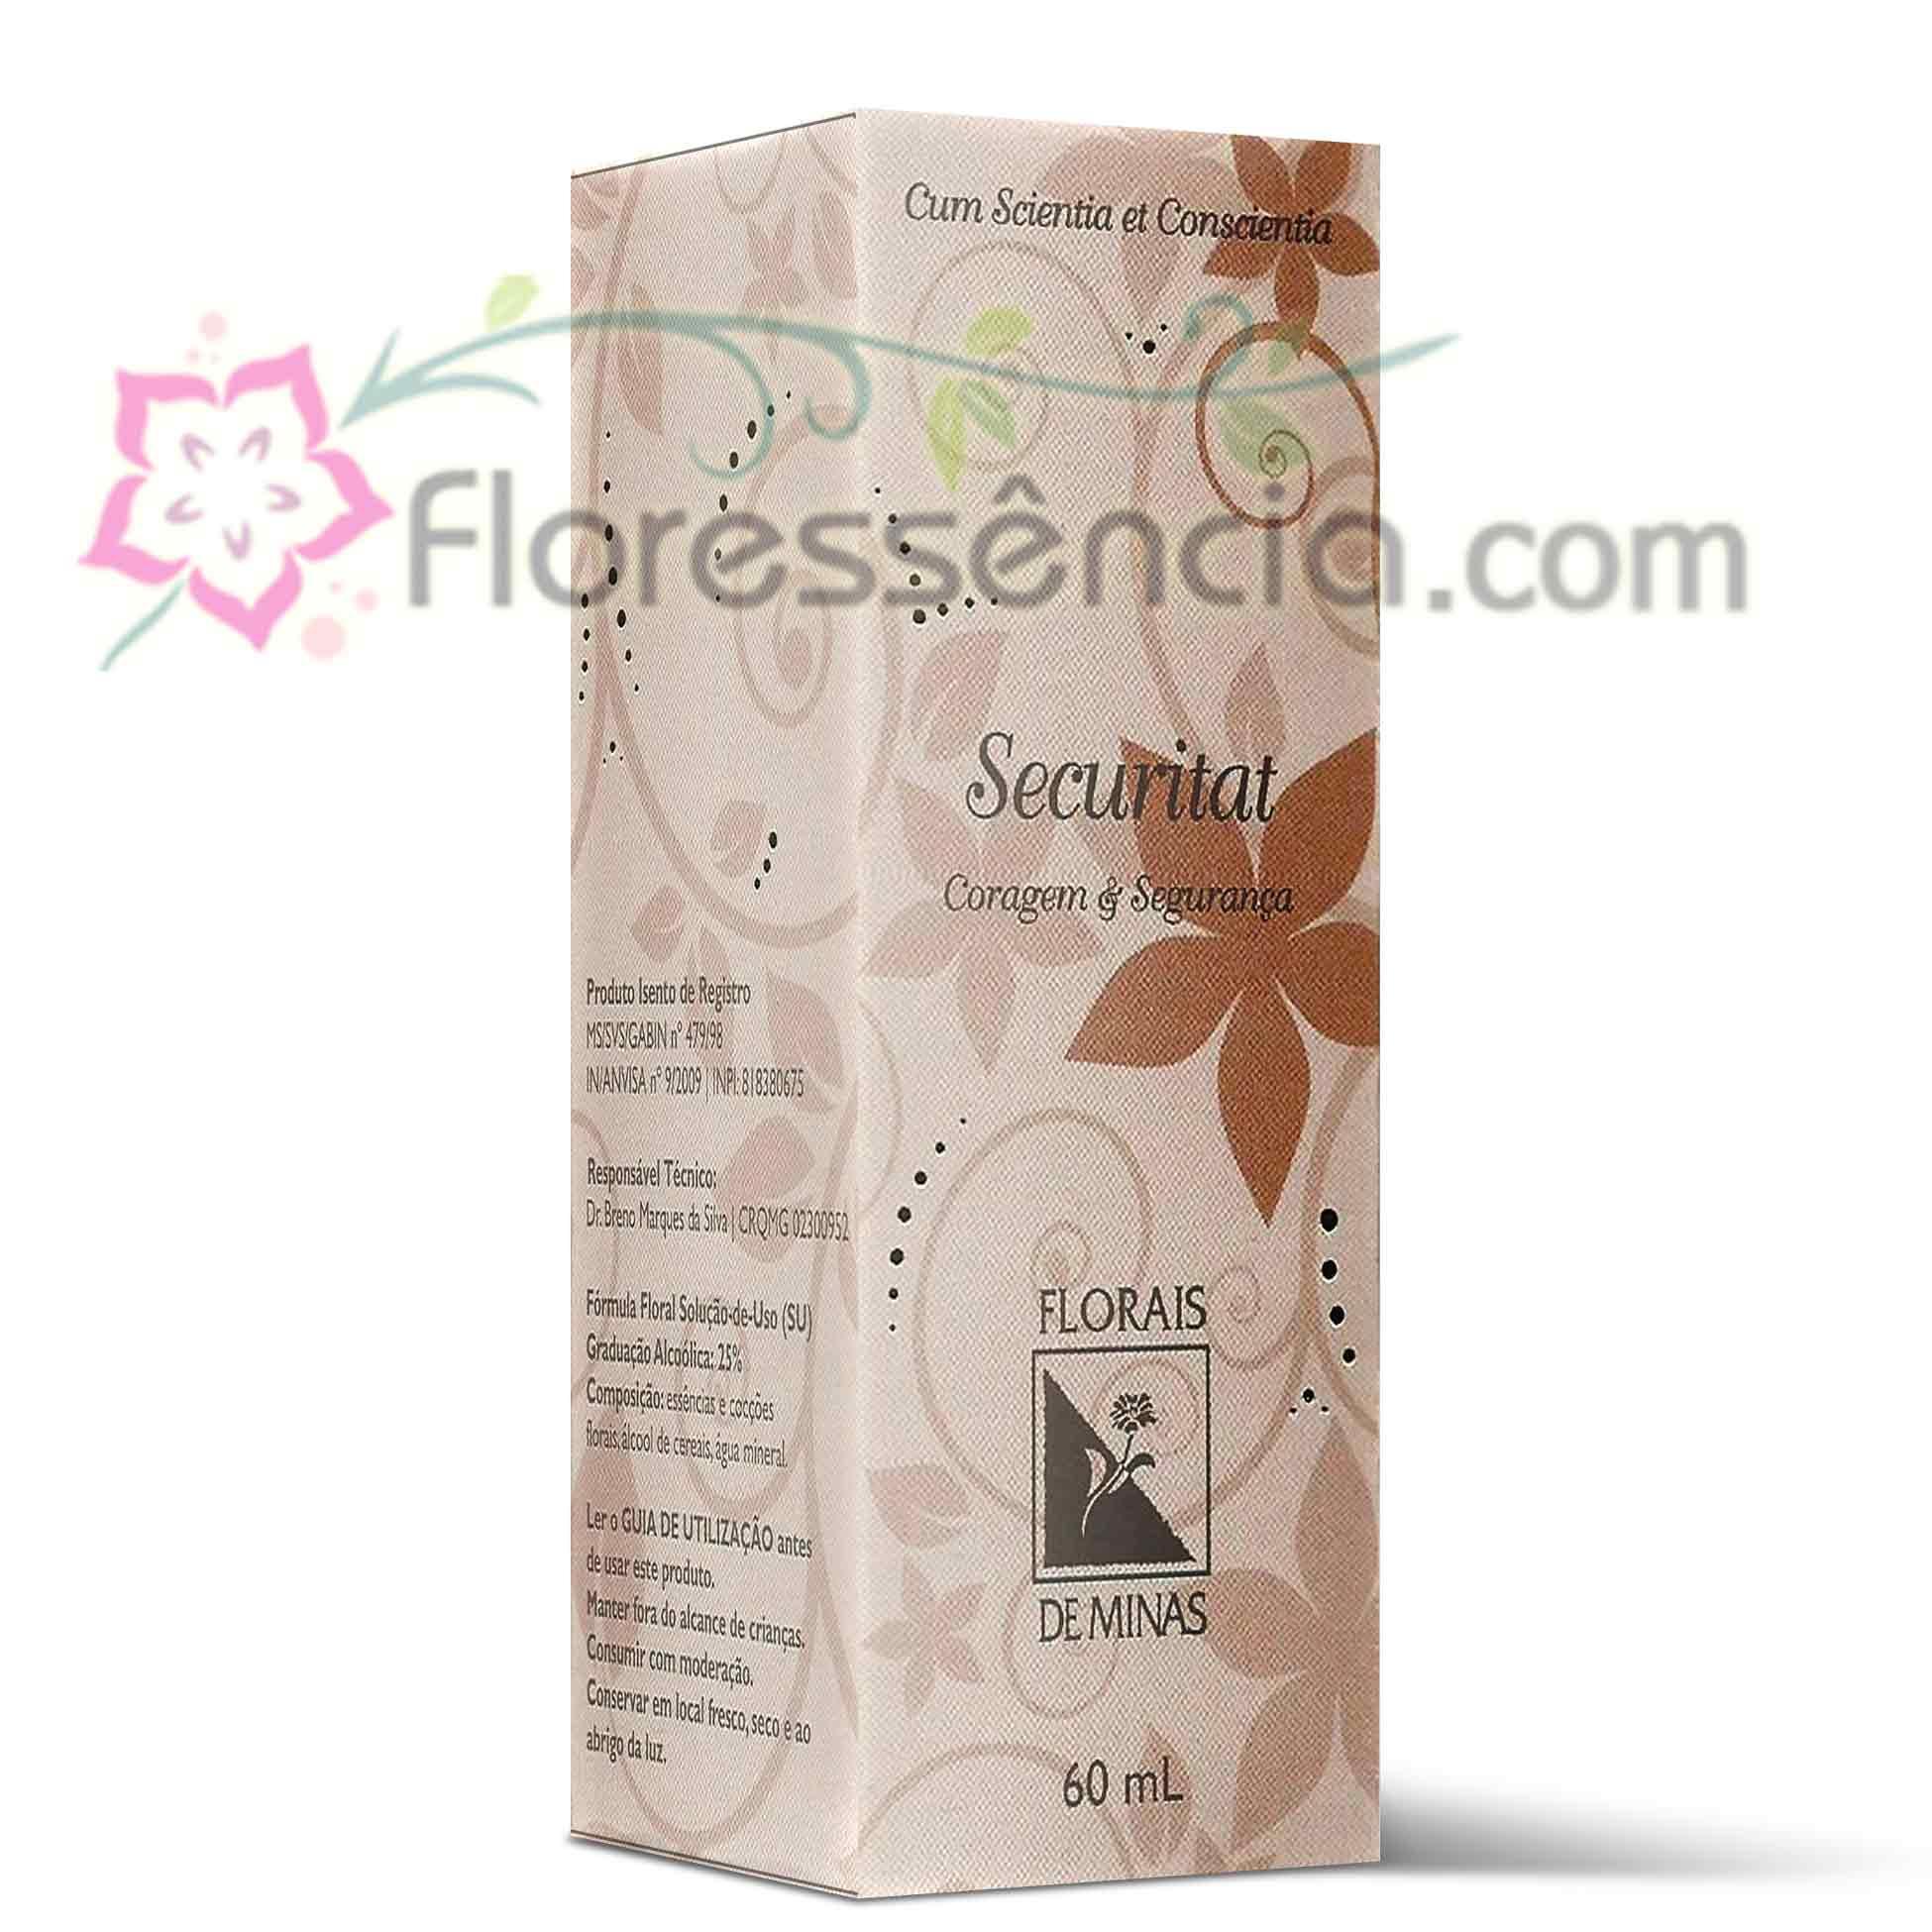 Securitat - 60 ml  - Floressência